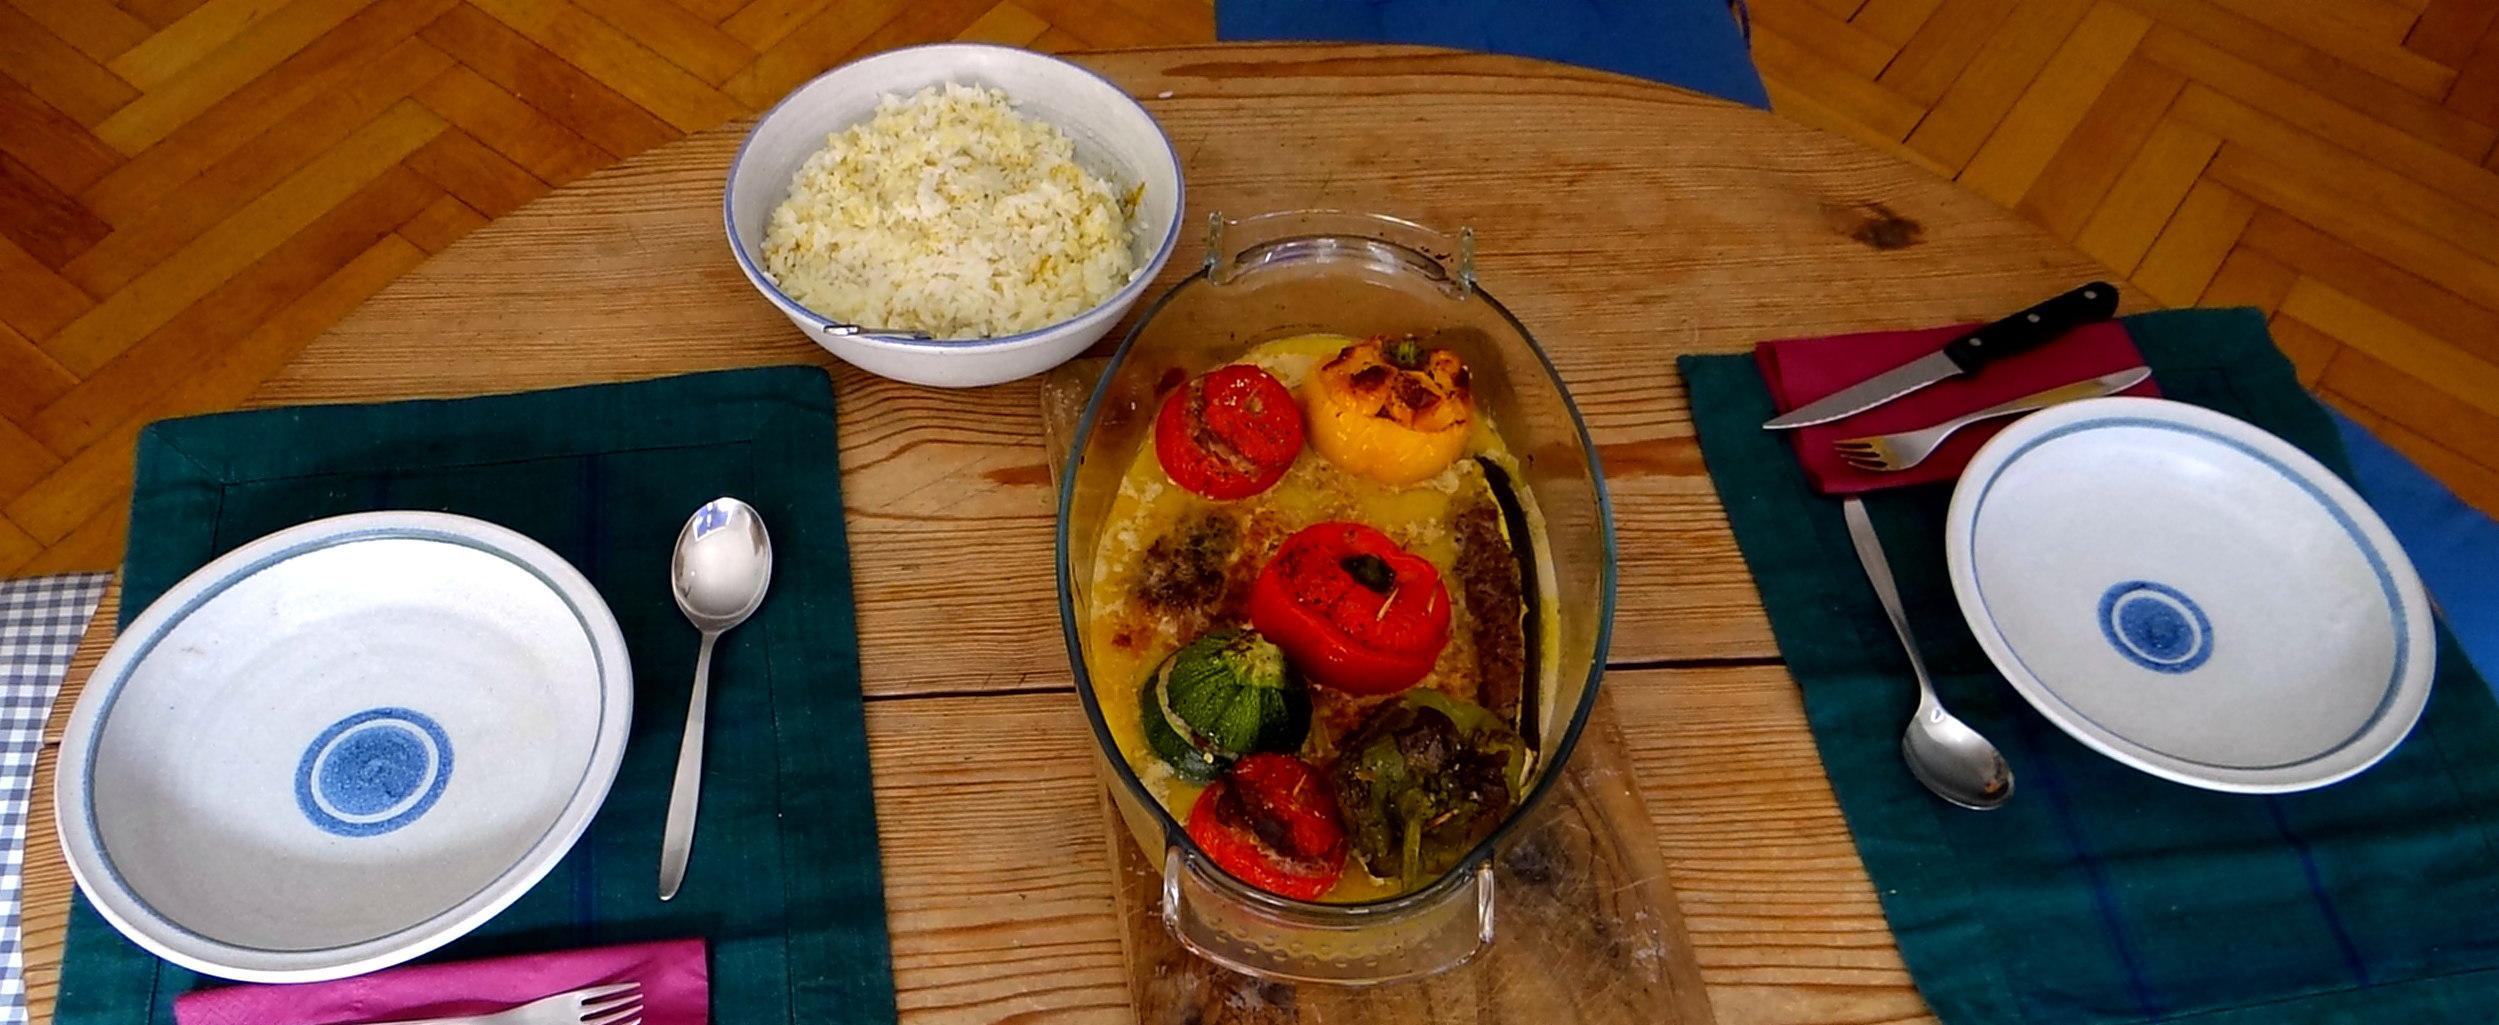 Gefüllte Paprika,Schmorgurke,Tomate,Zucchini,Reis,Bananeneis (3)